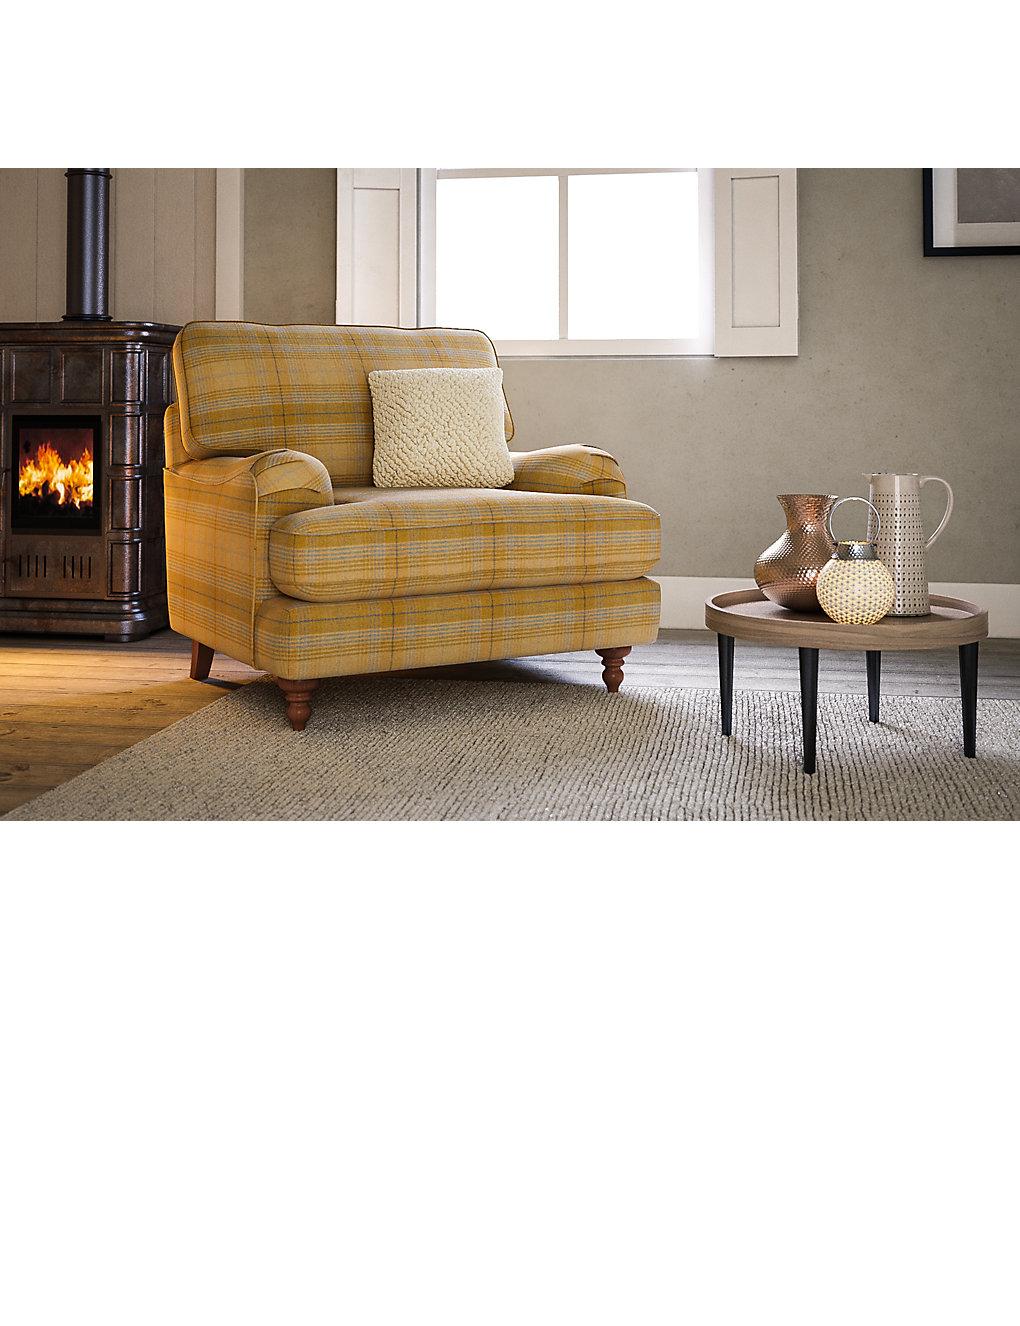 Design 2000 Sofa Outlet Reviews